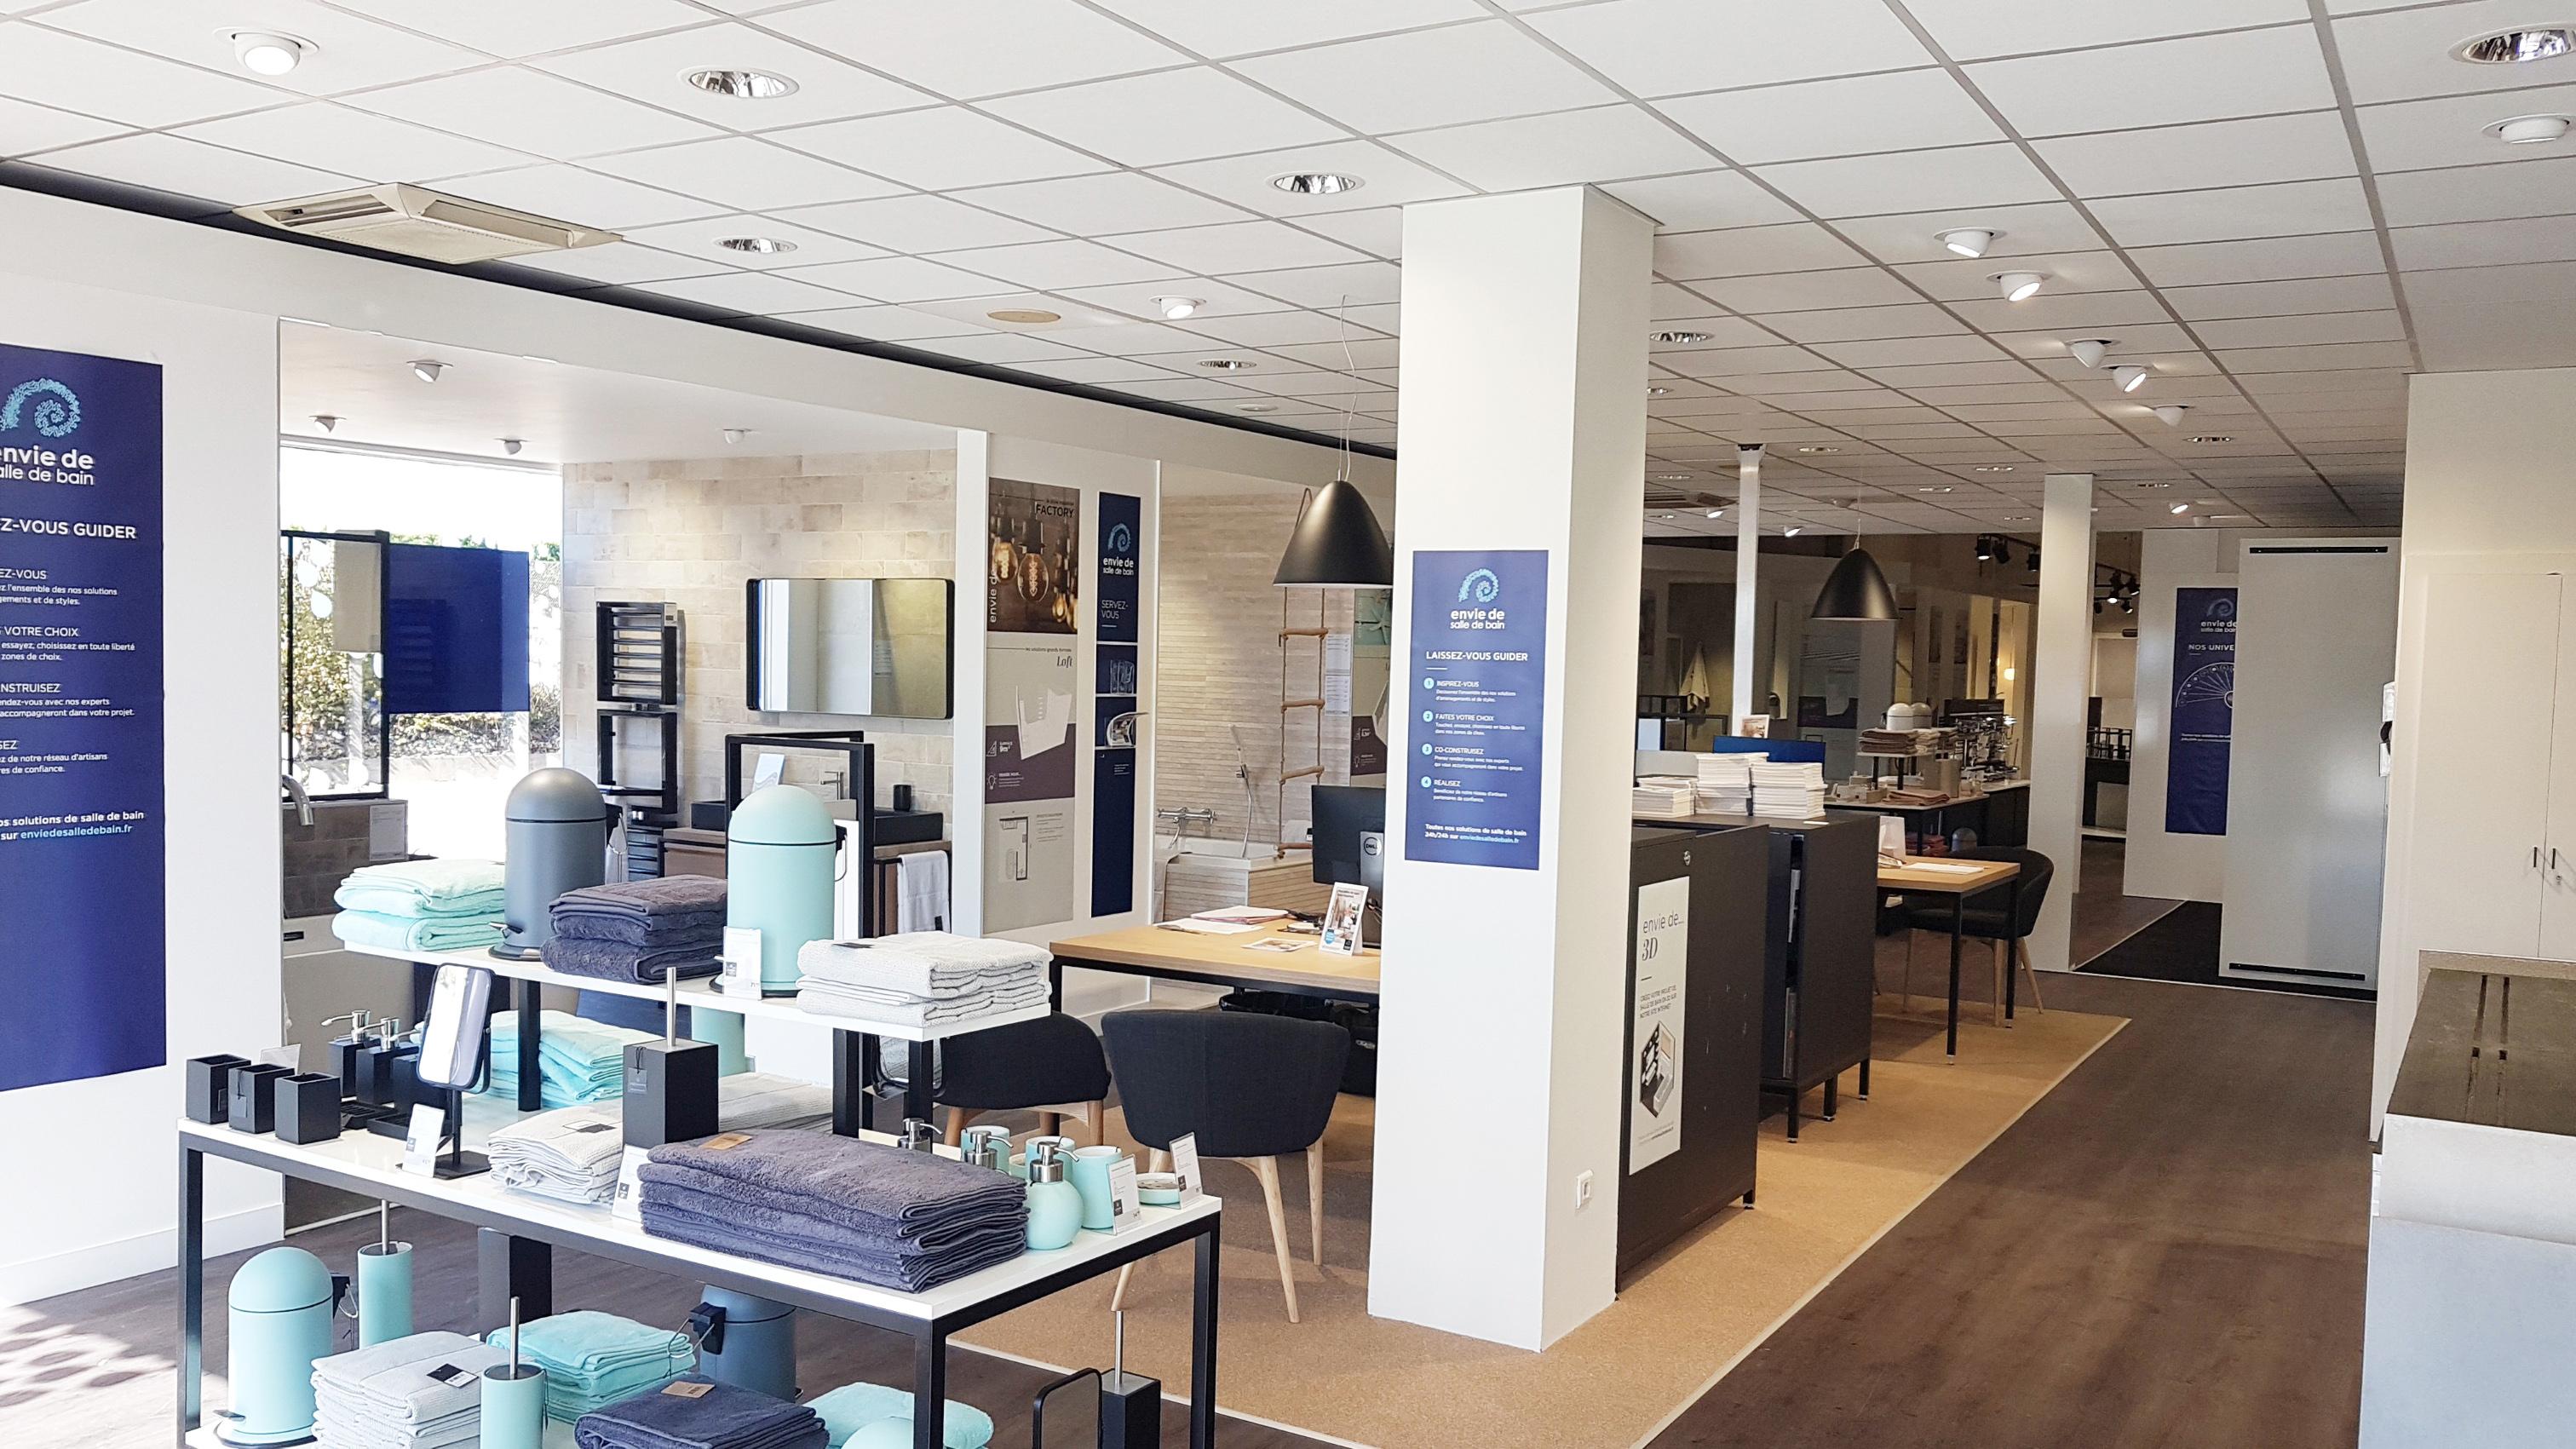 Envie De Salle De Bain Ouvre Son Nouveau Magasin A Dijon 21